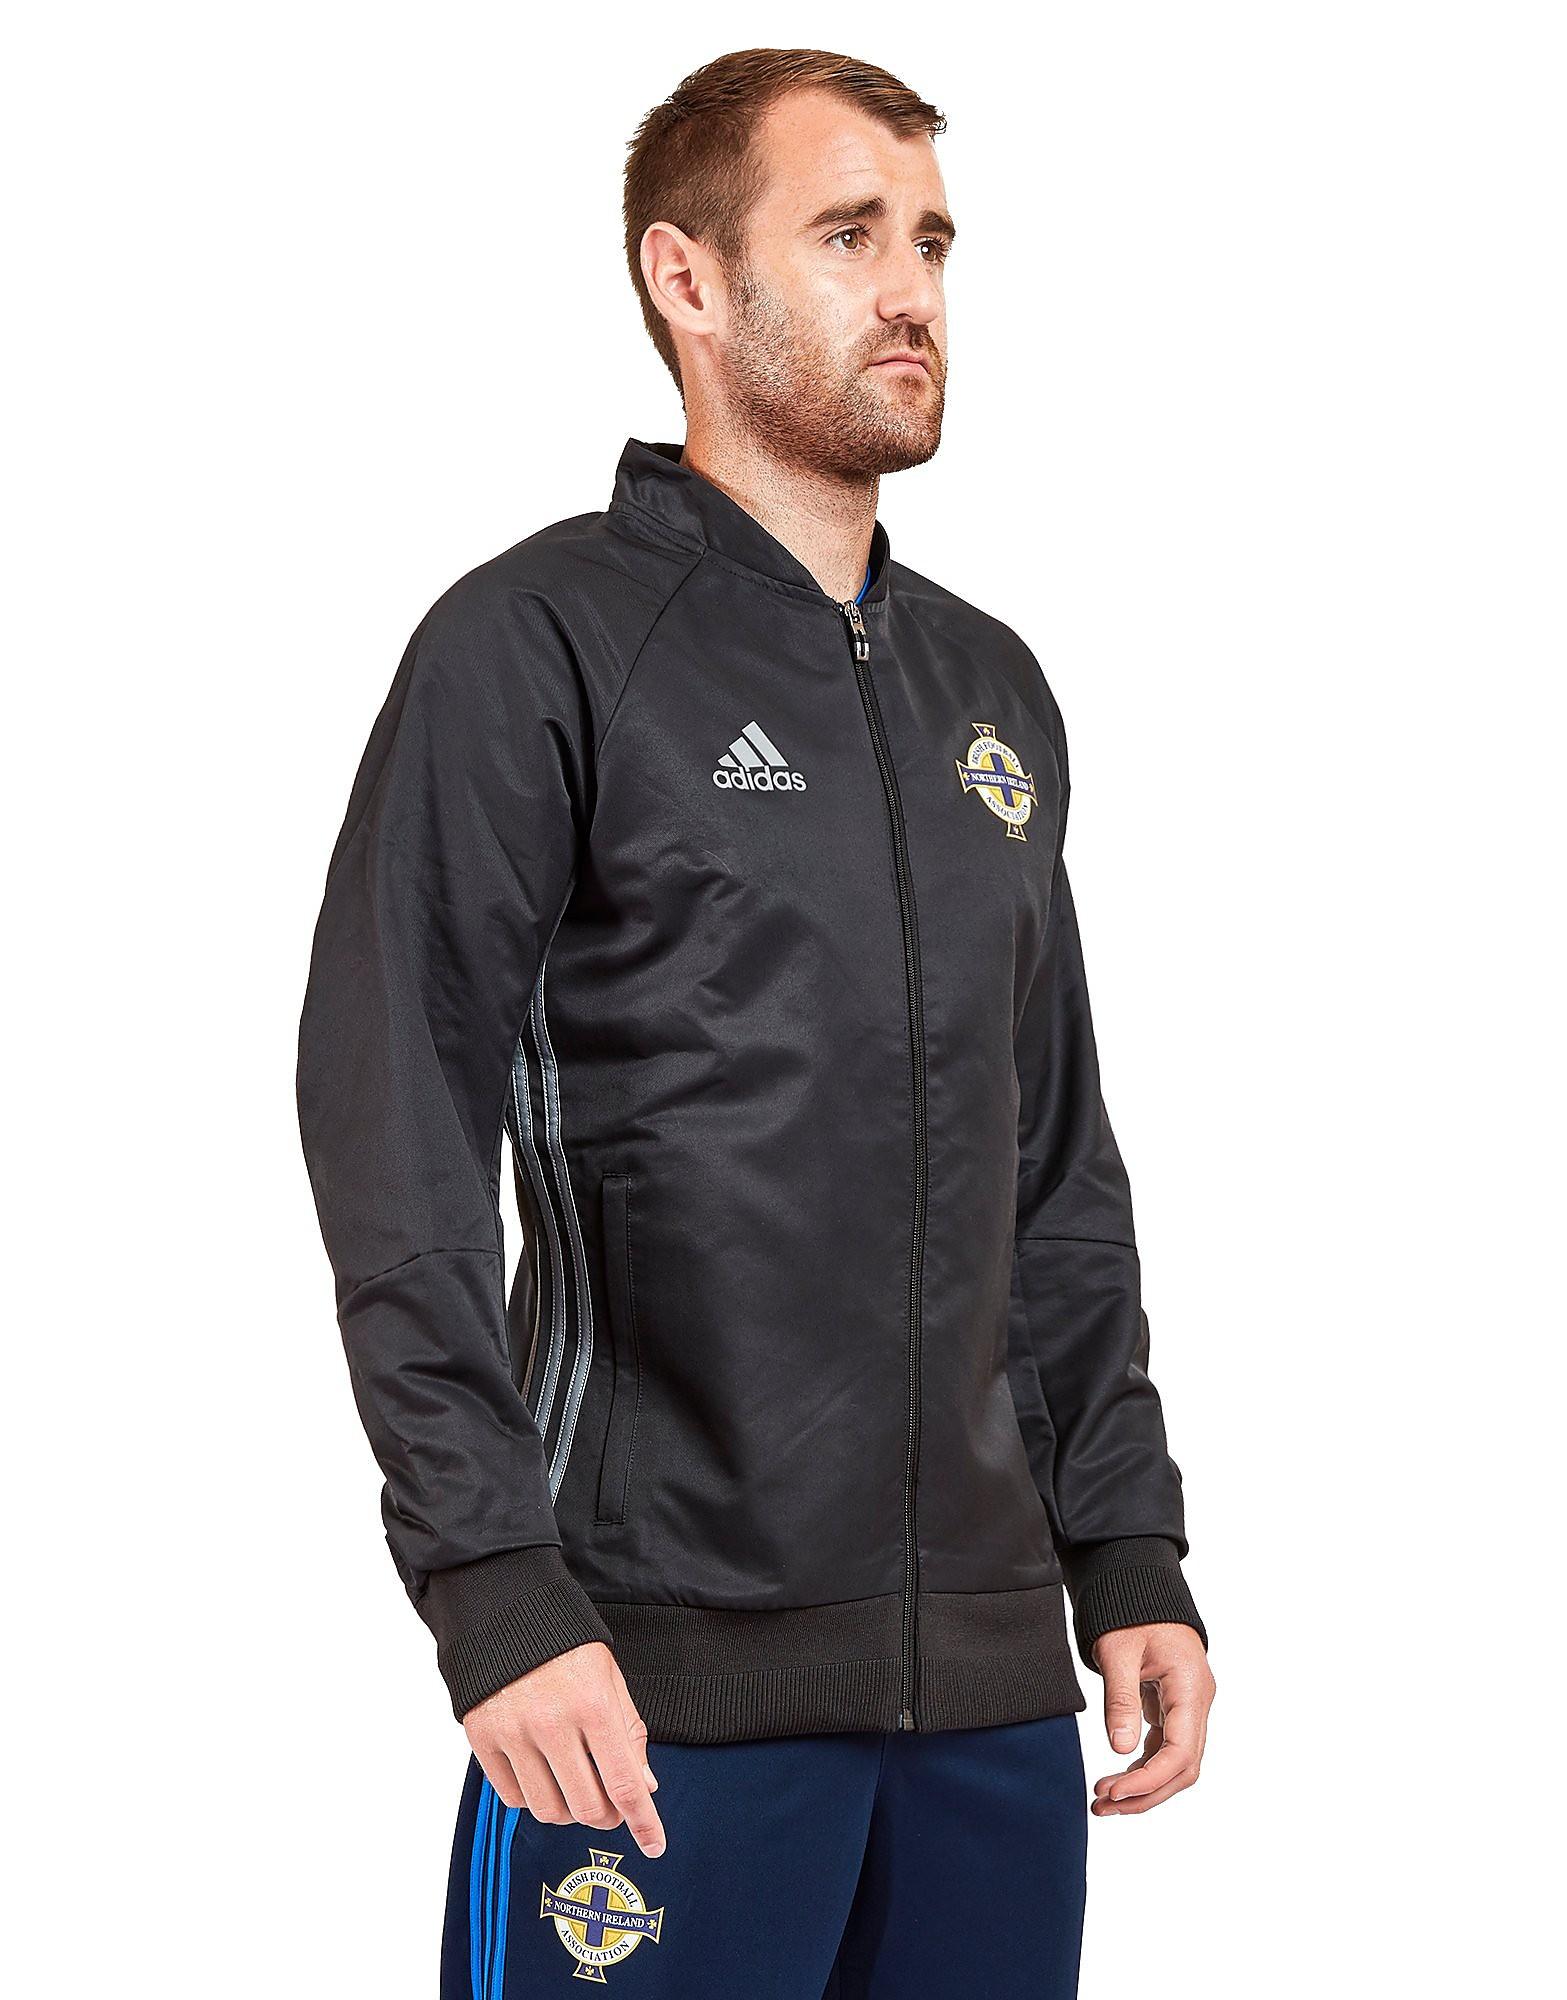 adidas Northern Ireland 2016/17 Anthem Jacket